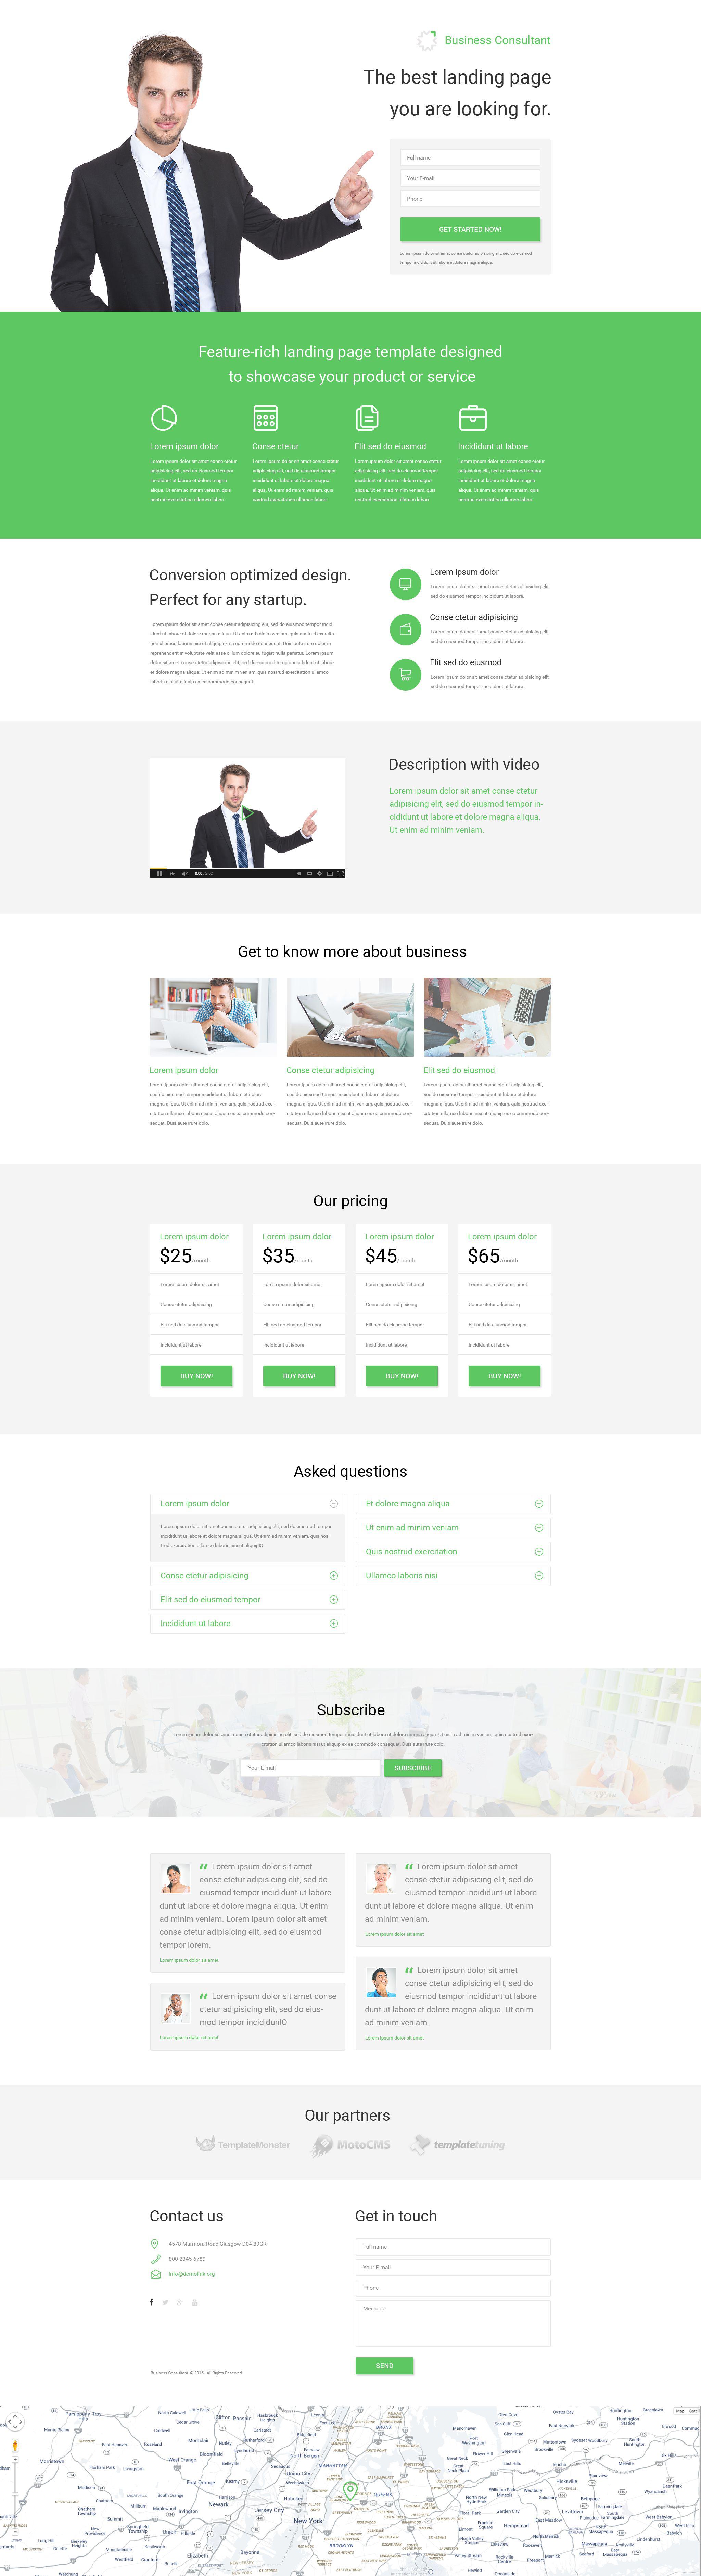 Responsywny szablon Landing Page #53788 na temat: biznes i usługi - zrzut ekranu